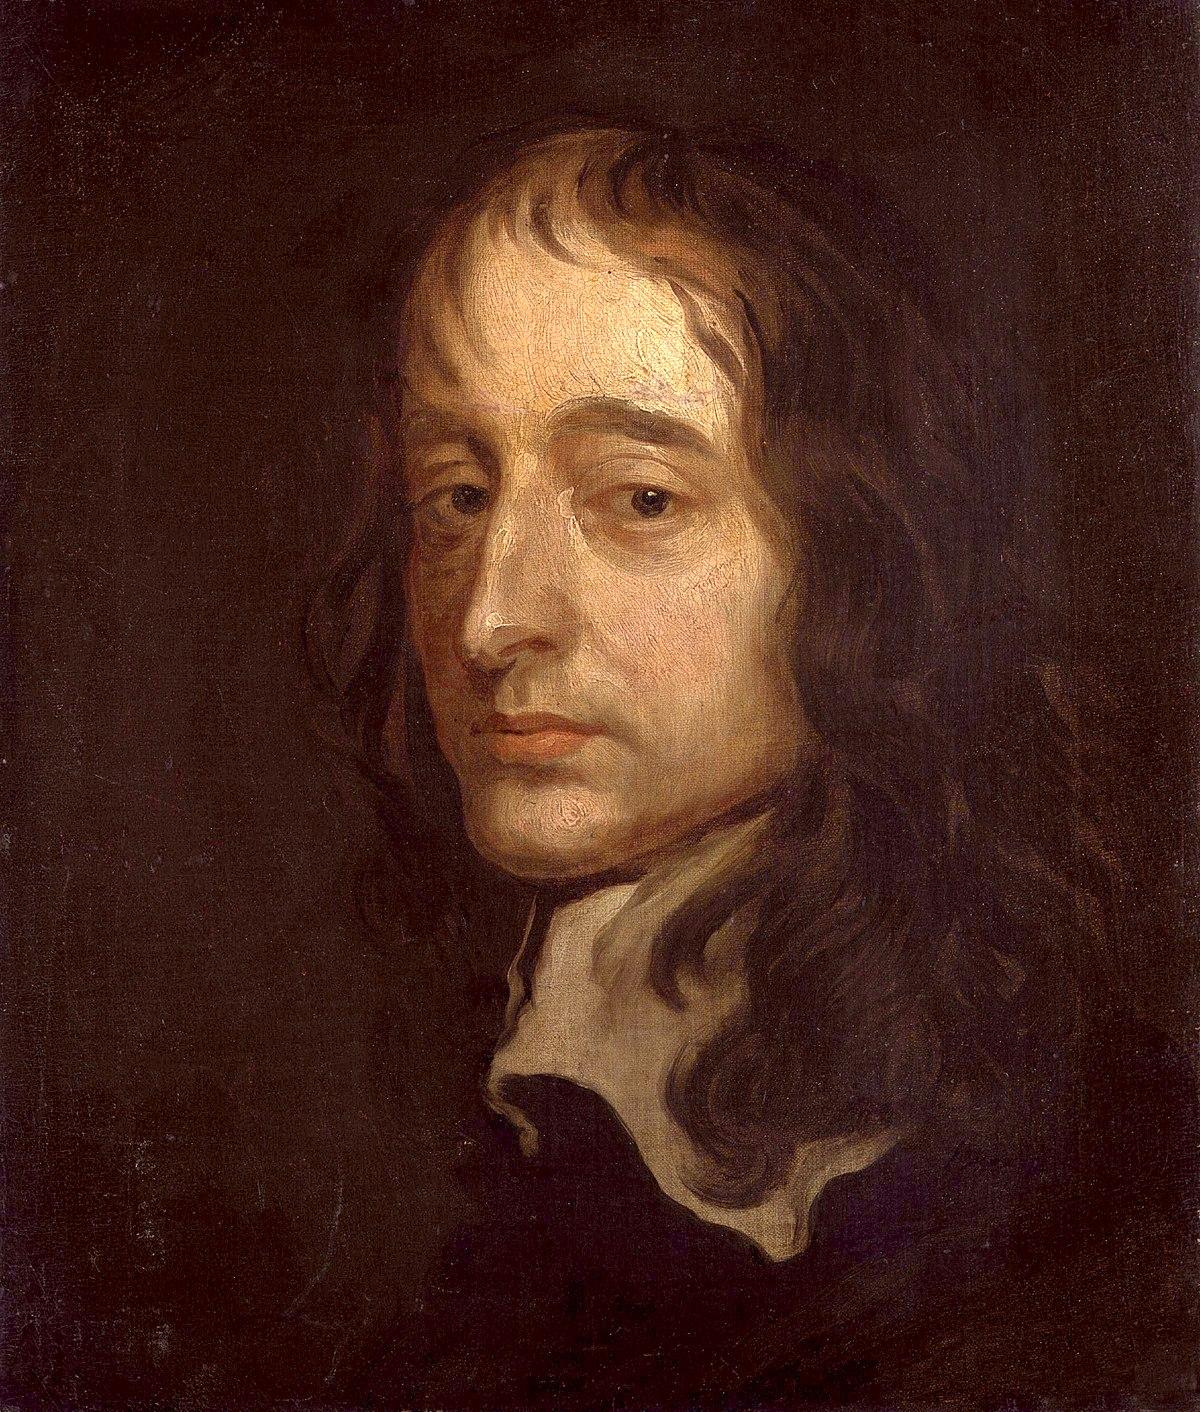 John Locke Natural Rights Quote: John Selden